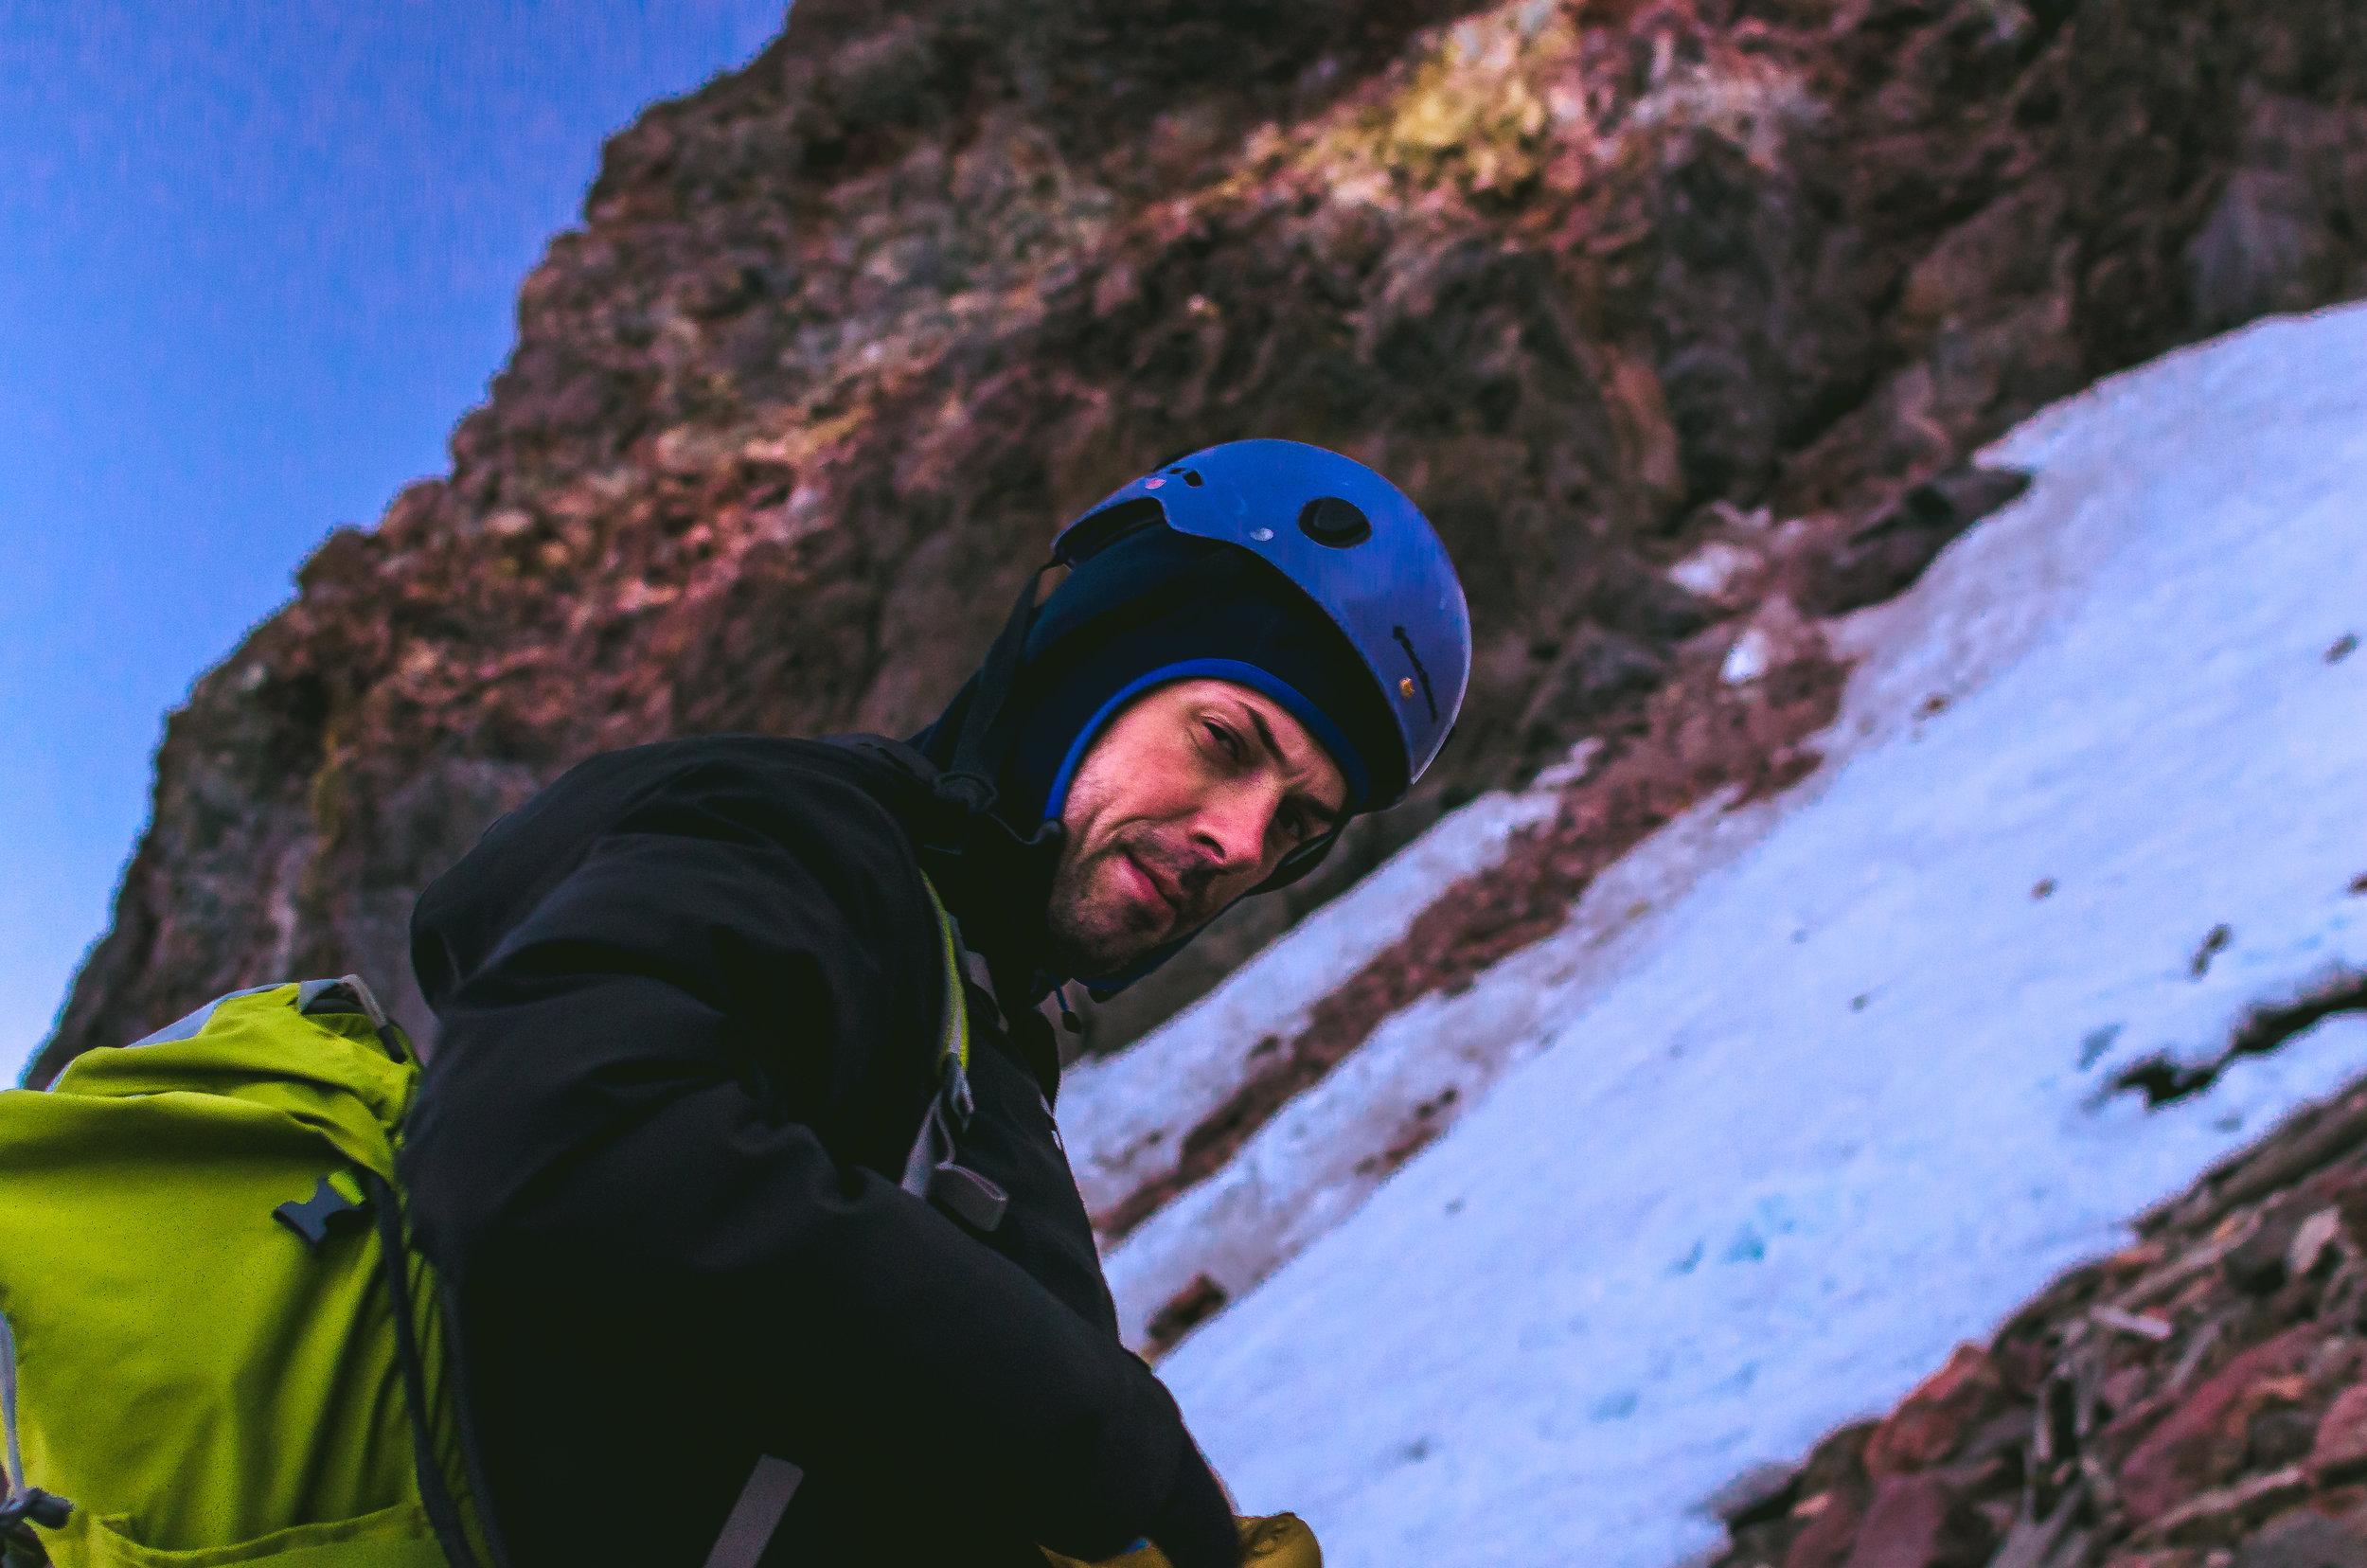 Wito S., Sport Climber, Mt. Adams, Washington